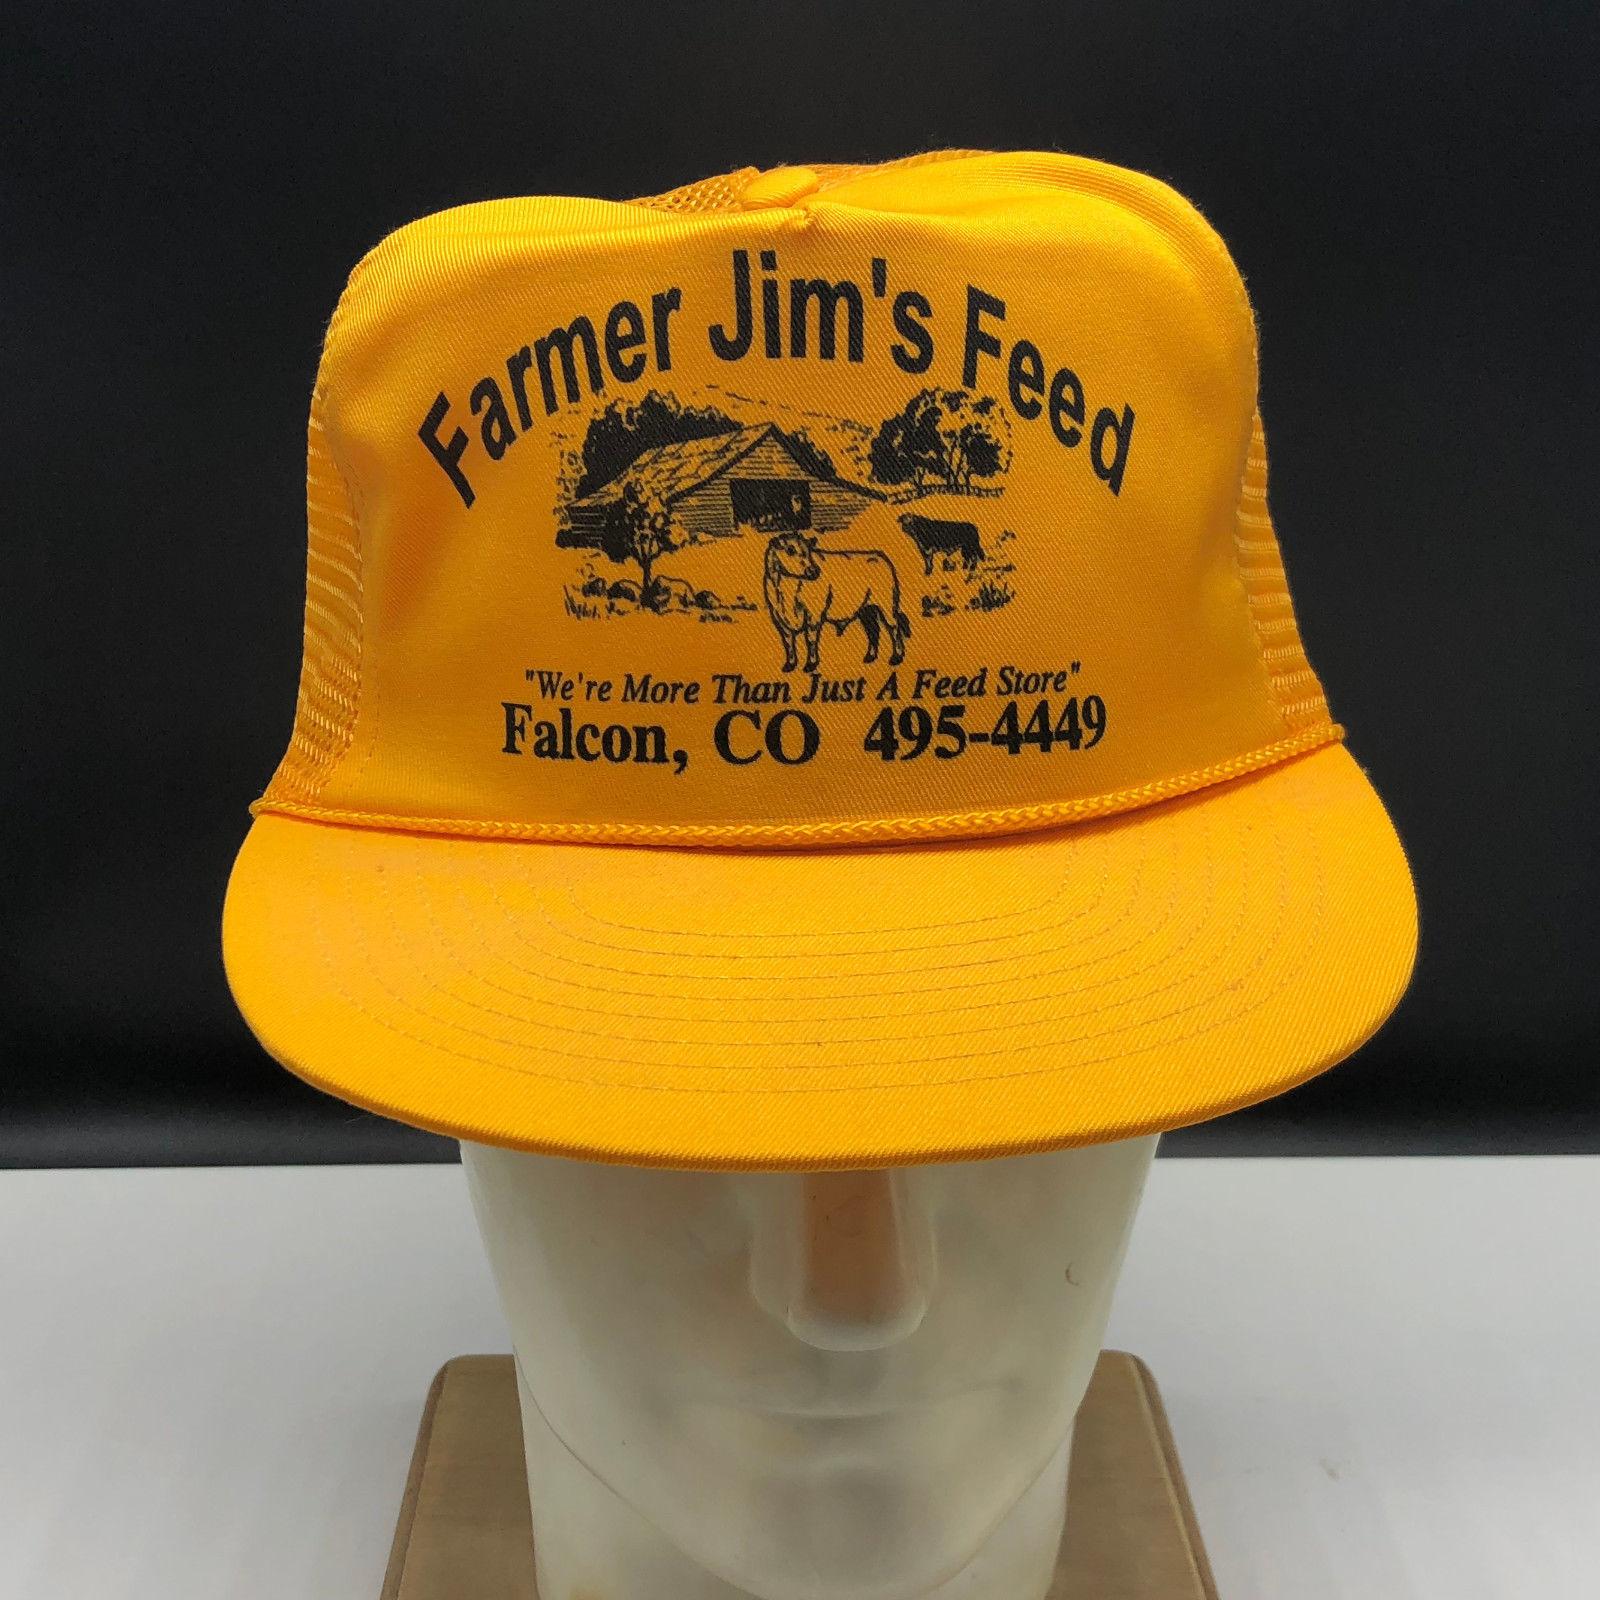 e95a6b3223fa1 Snapback Trucker Hat Cap Vintage Strapback and 22 similar items. S l1600